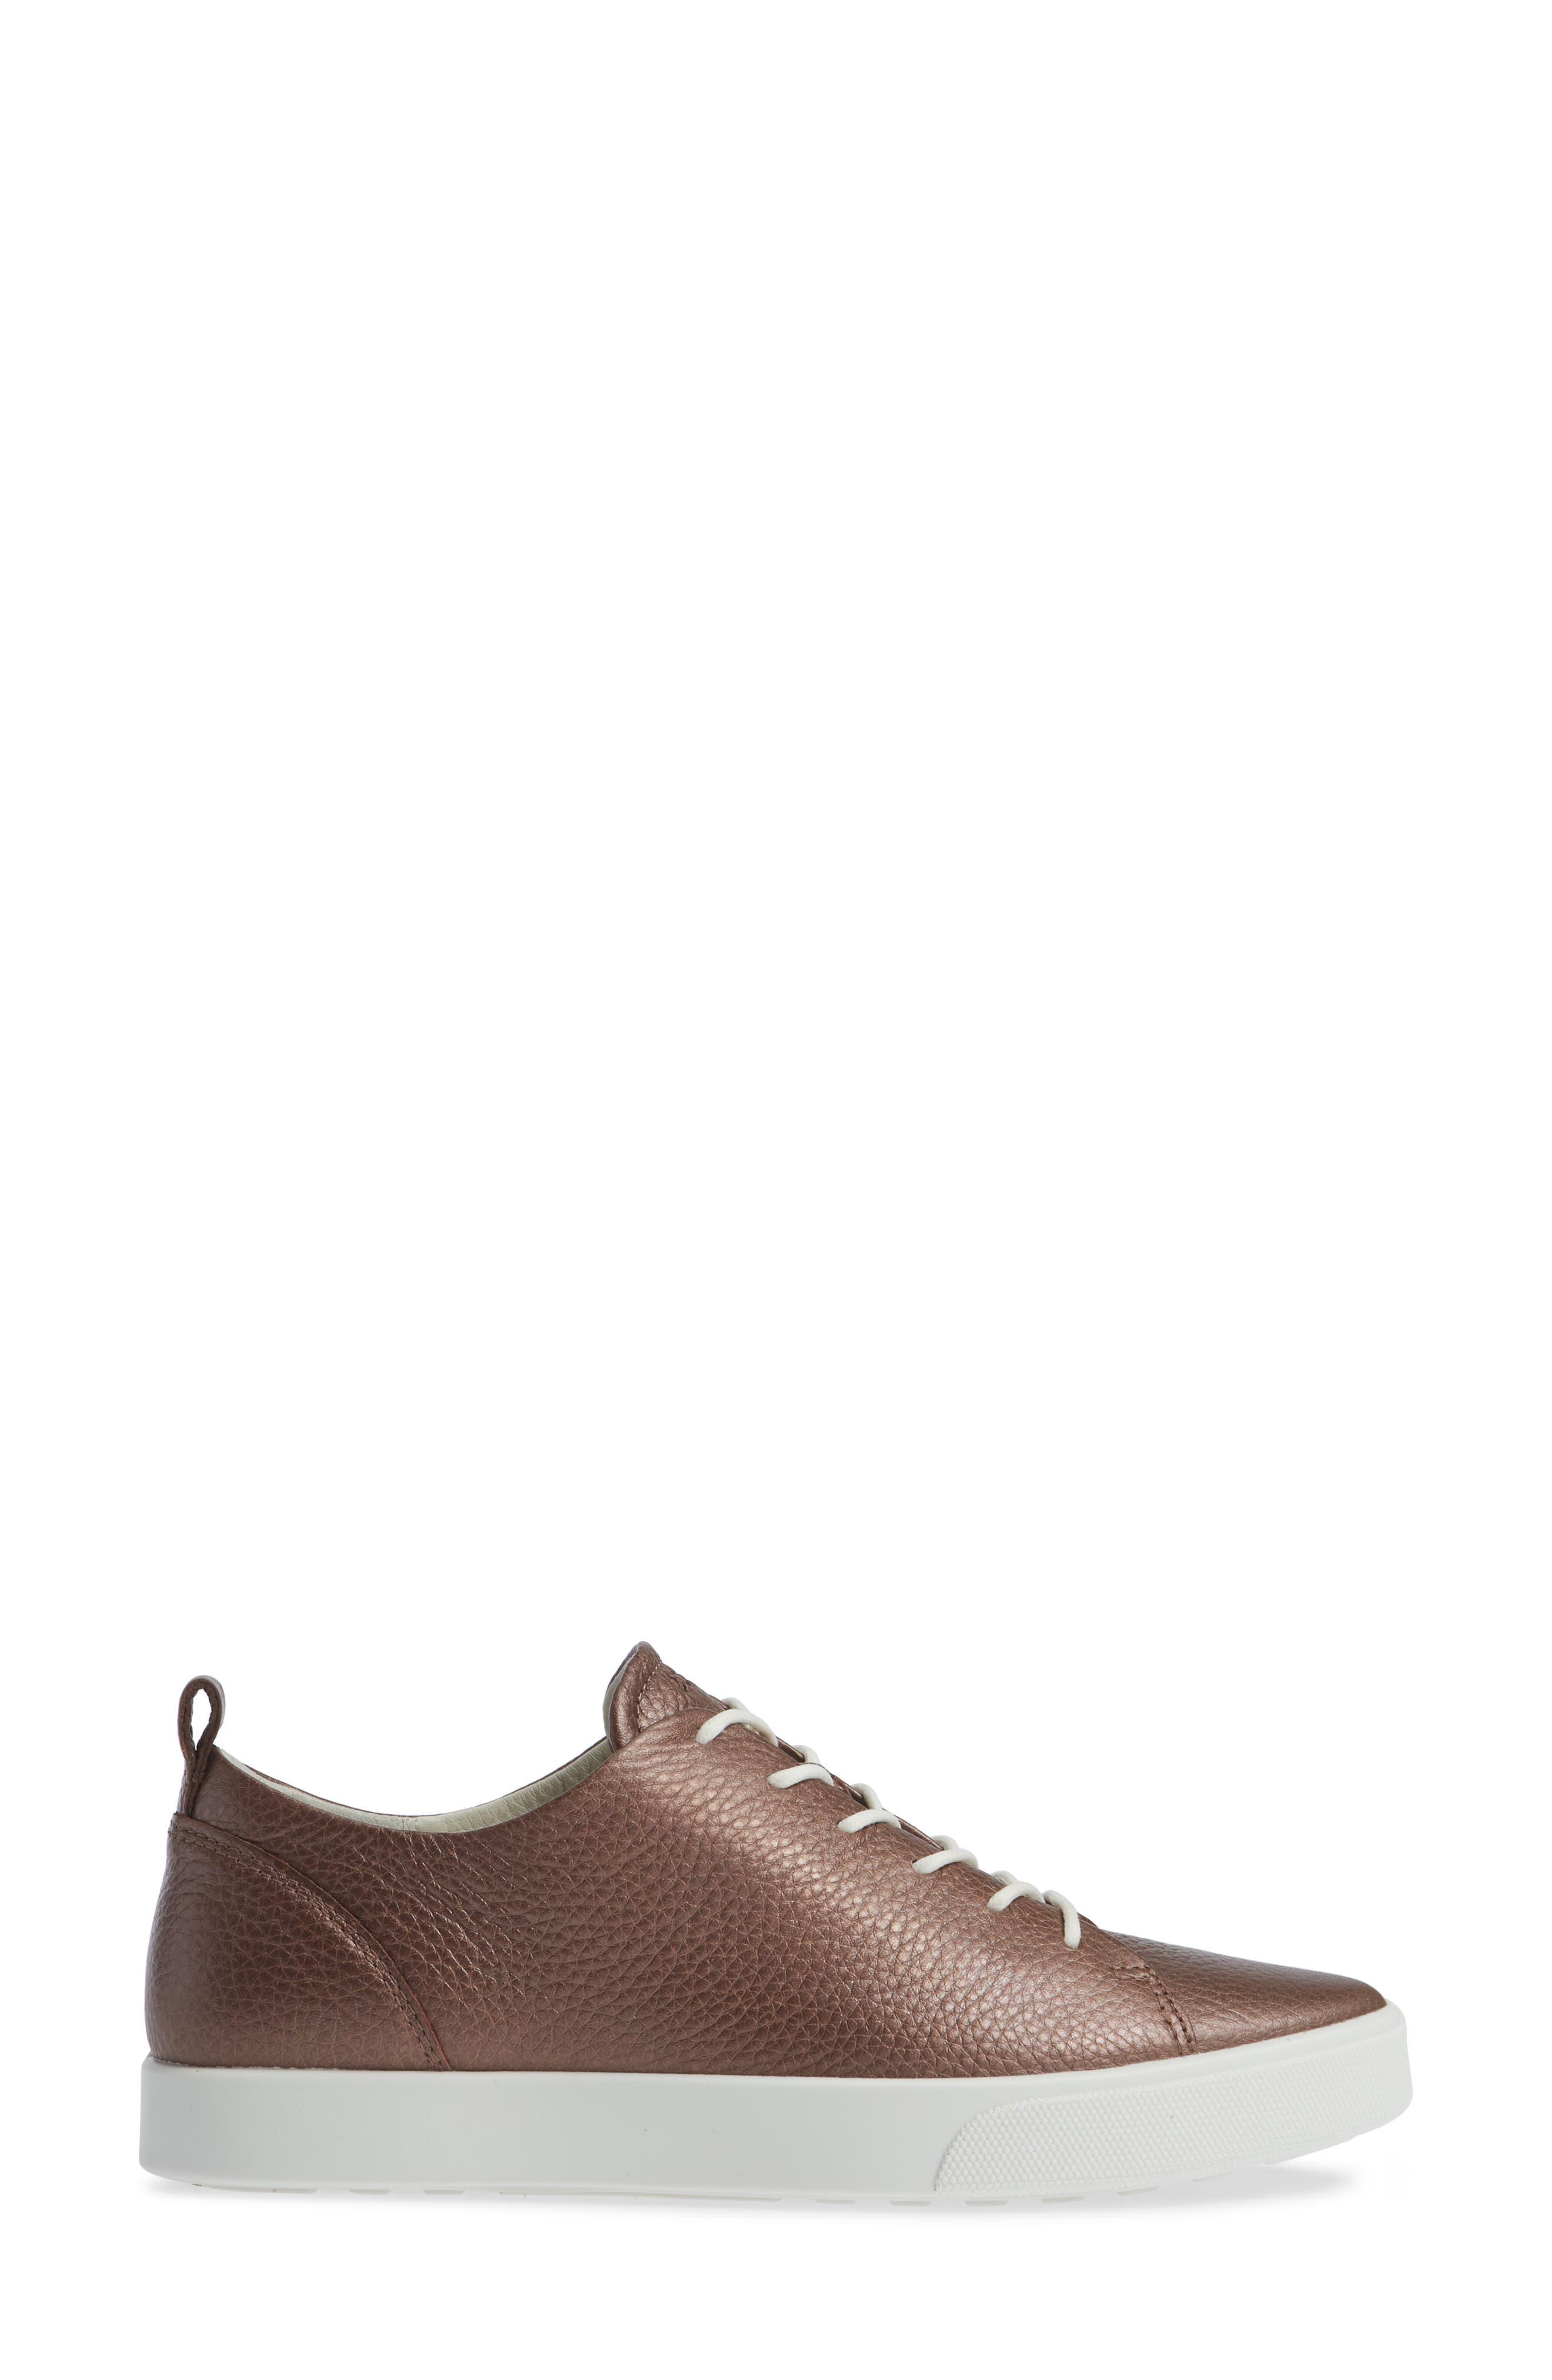 Gillian Sneaker,                             Alternate thumbnail 3, color,                             DEEP TAUPE/ BRONZE LEATHER